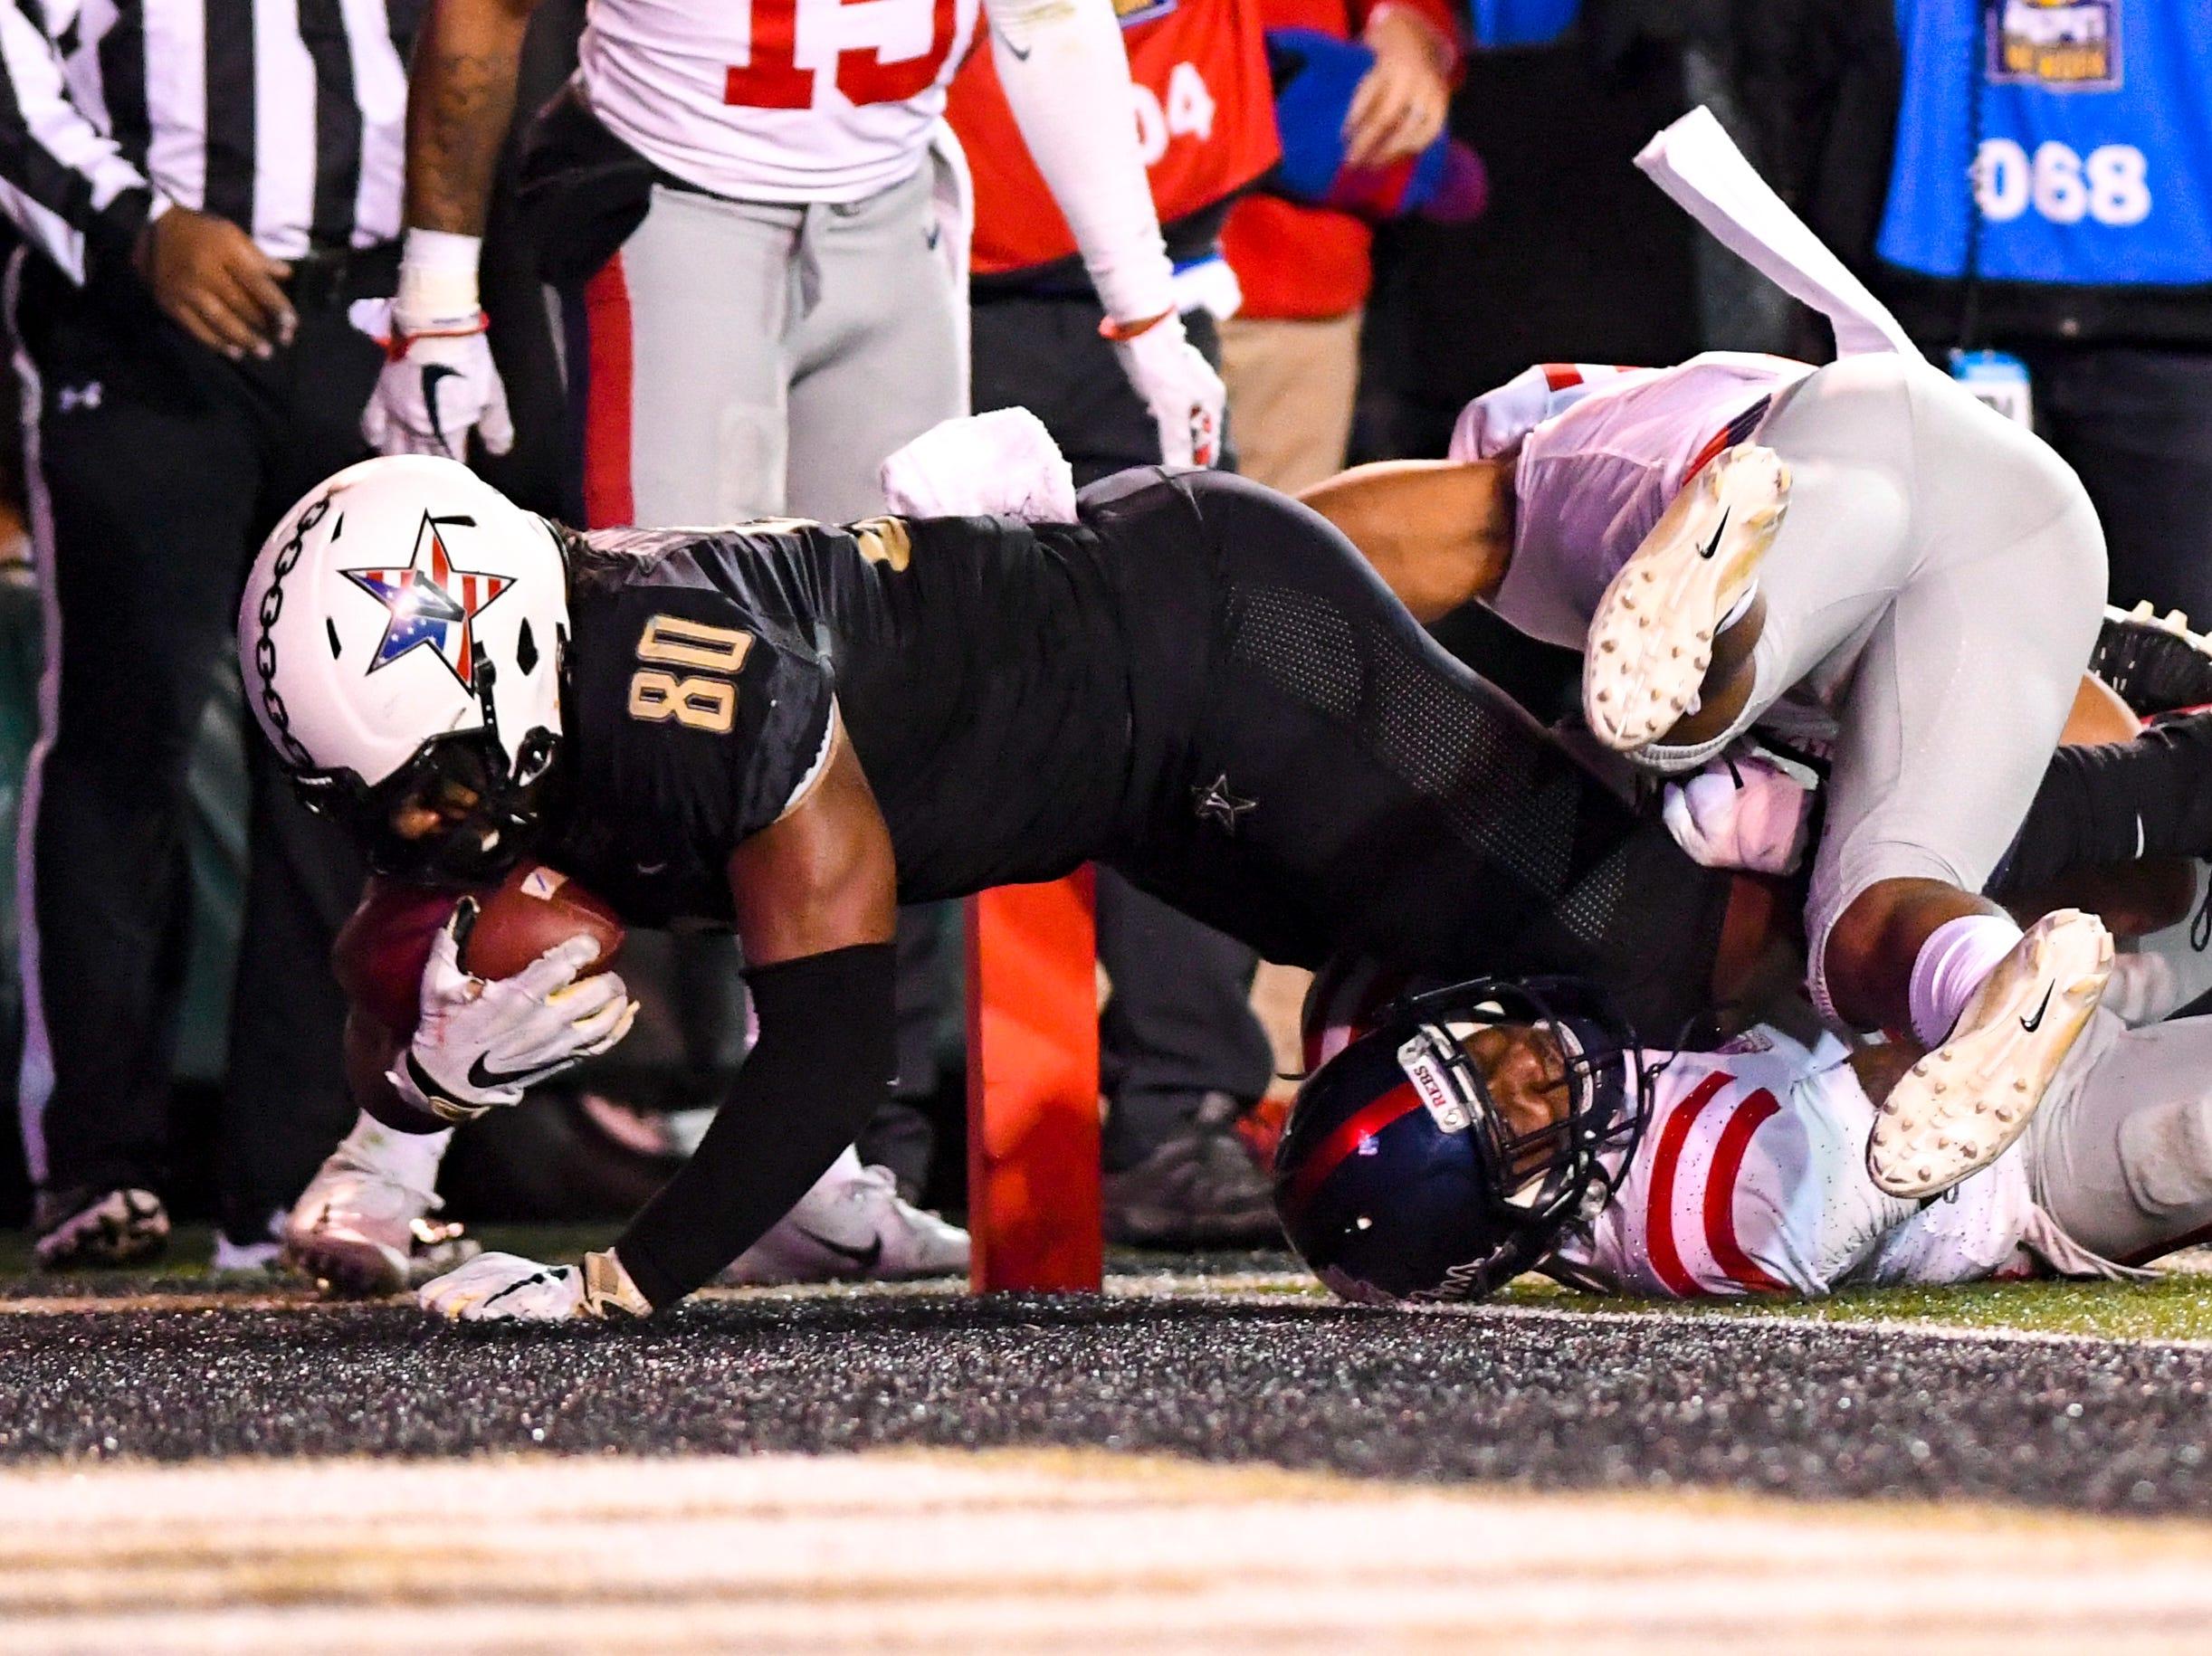 Vanderbilt tight end Jared Pinkney (80) falls into the endzone during Vanderbilt's game against Ole Miss at Vanderbilt Stadium in Nashville on Saturday, Nov. 17, 2018.